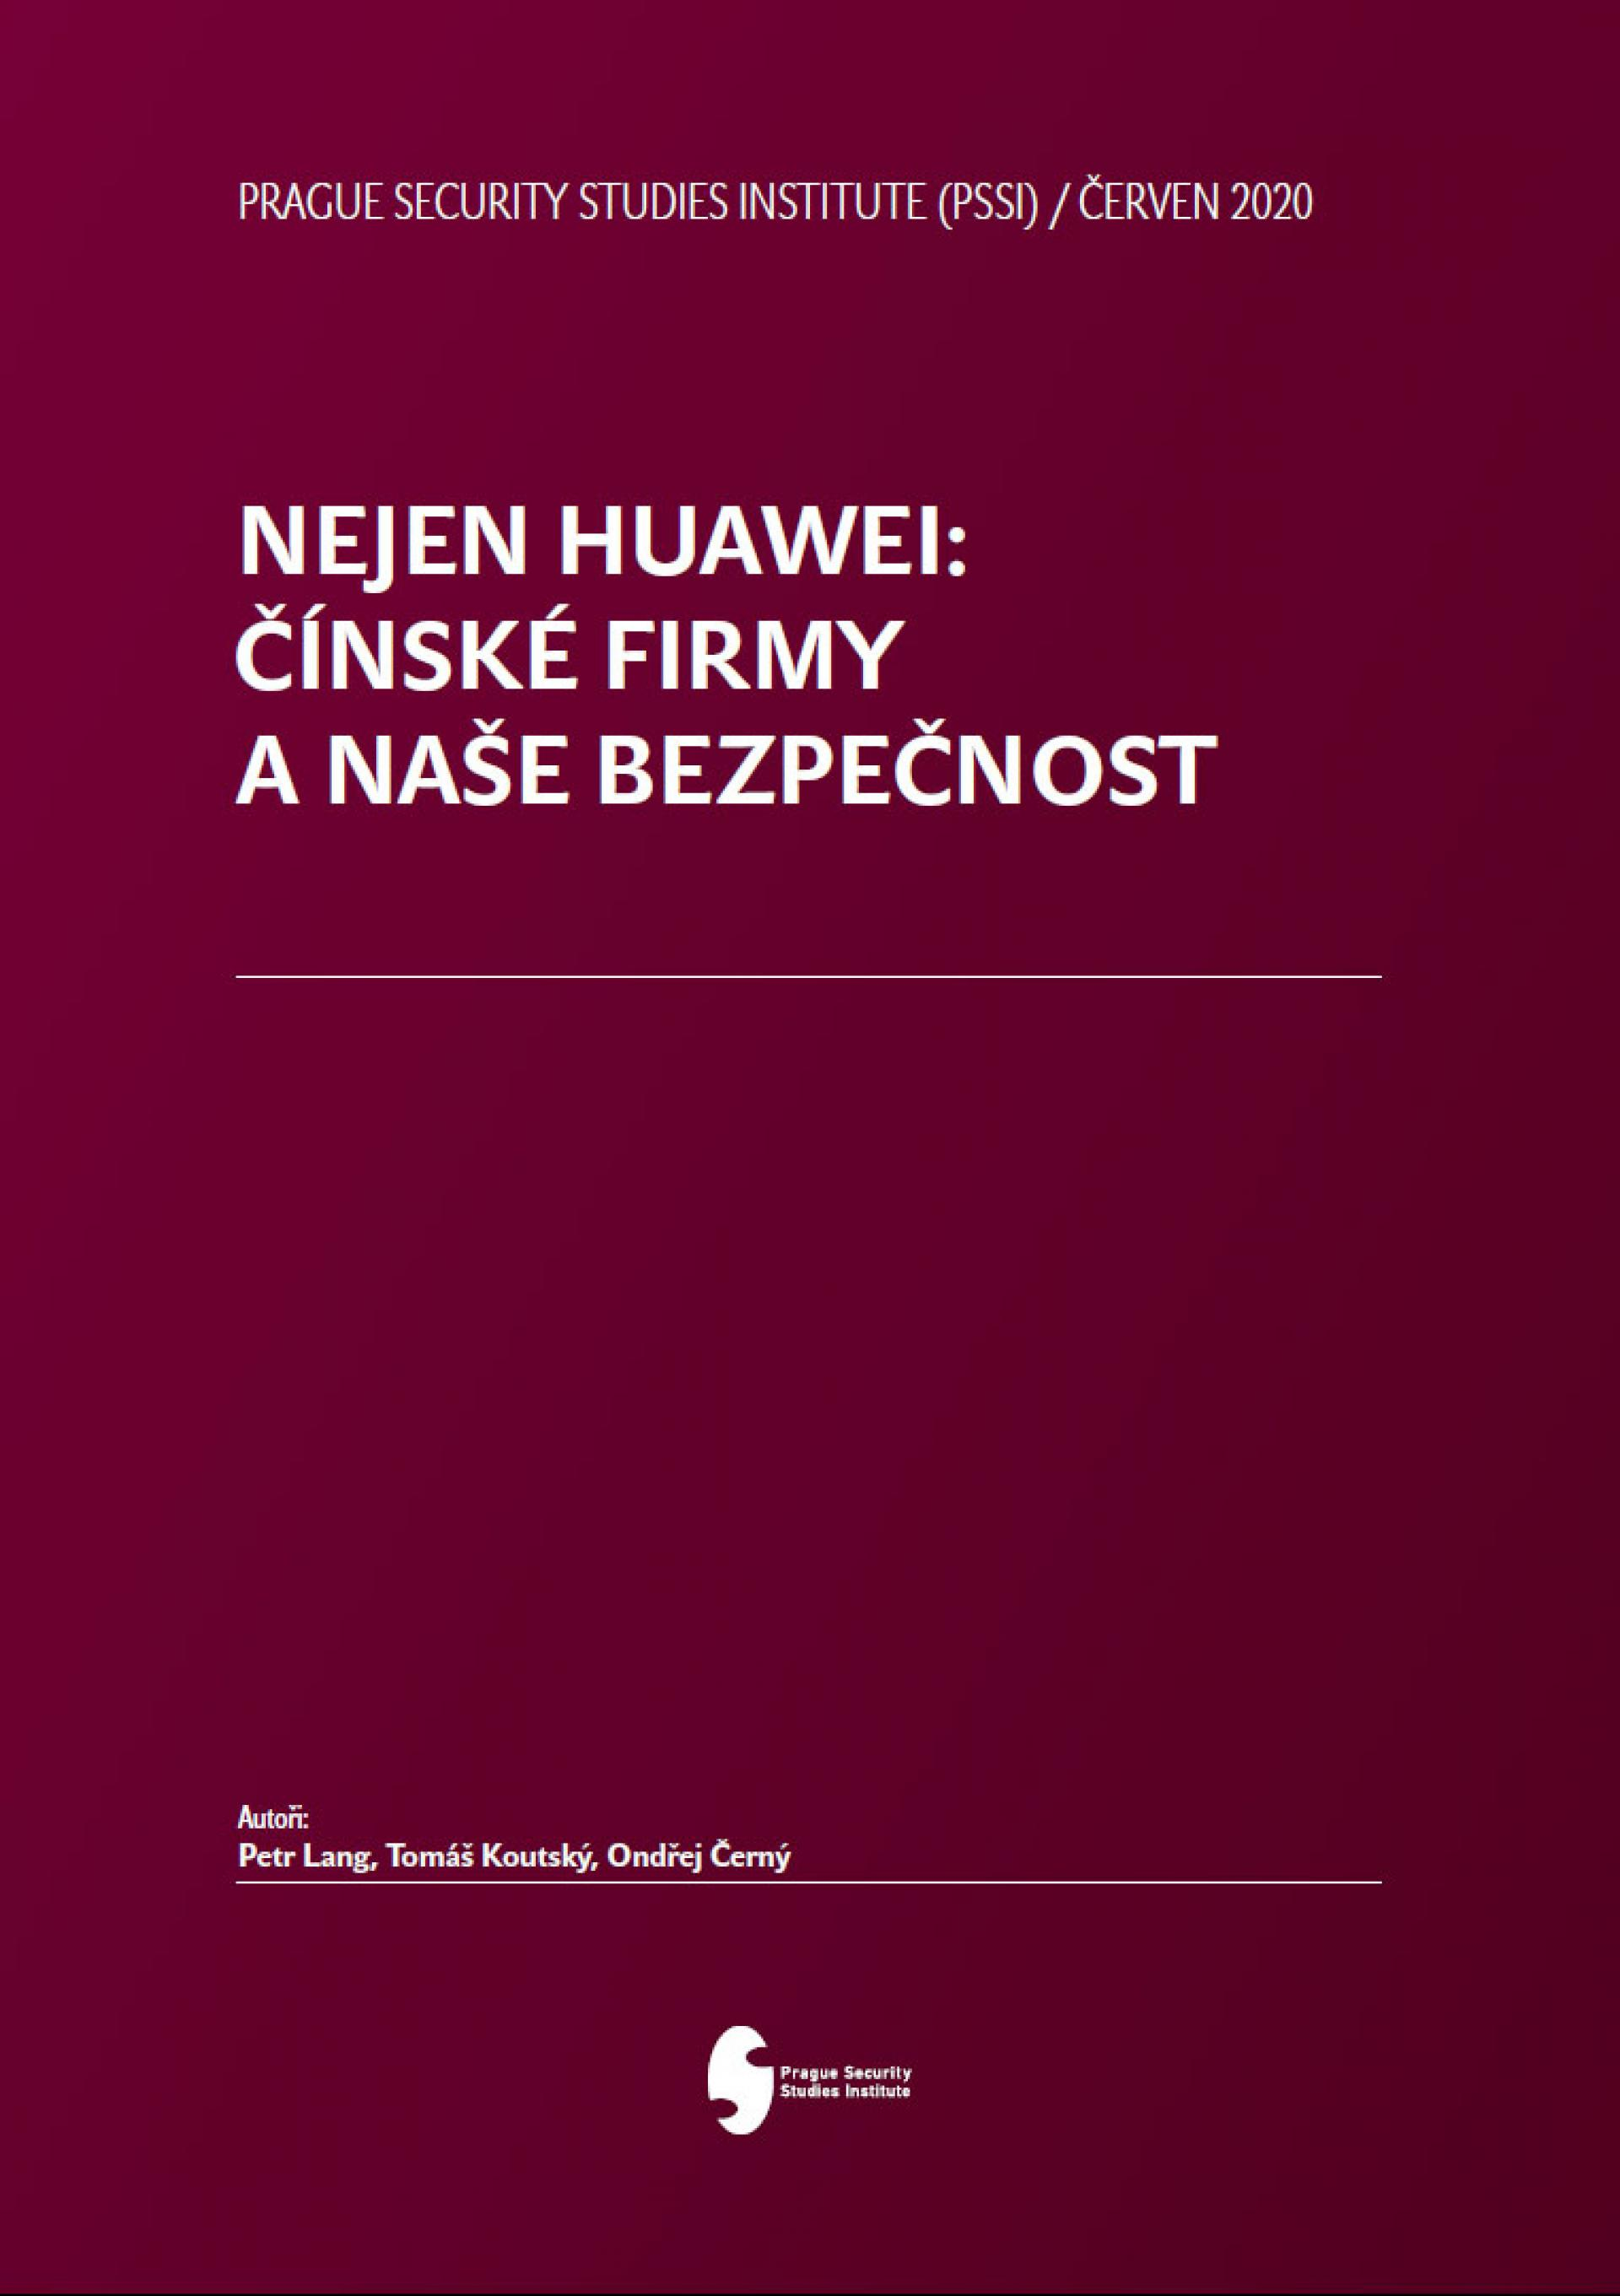 Nejen-Huawei-cover-photo